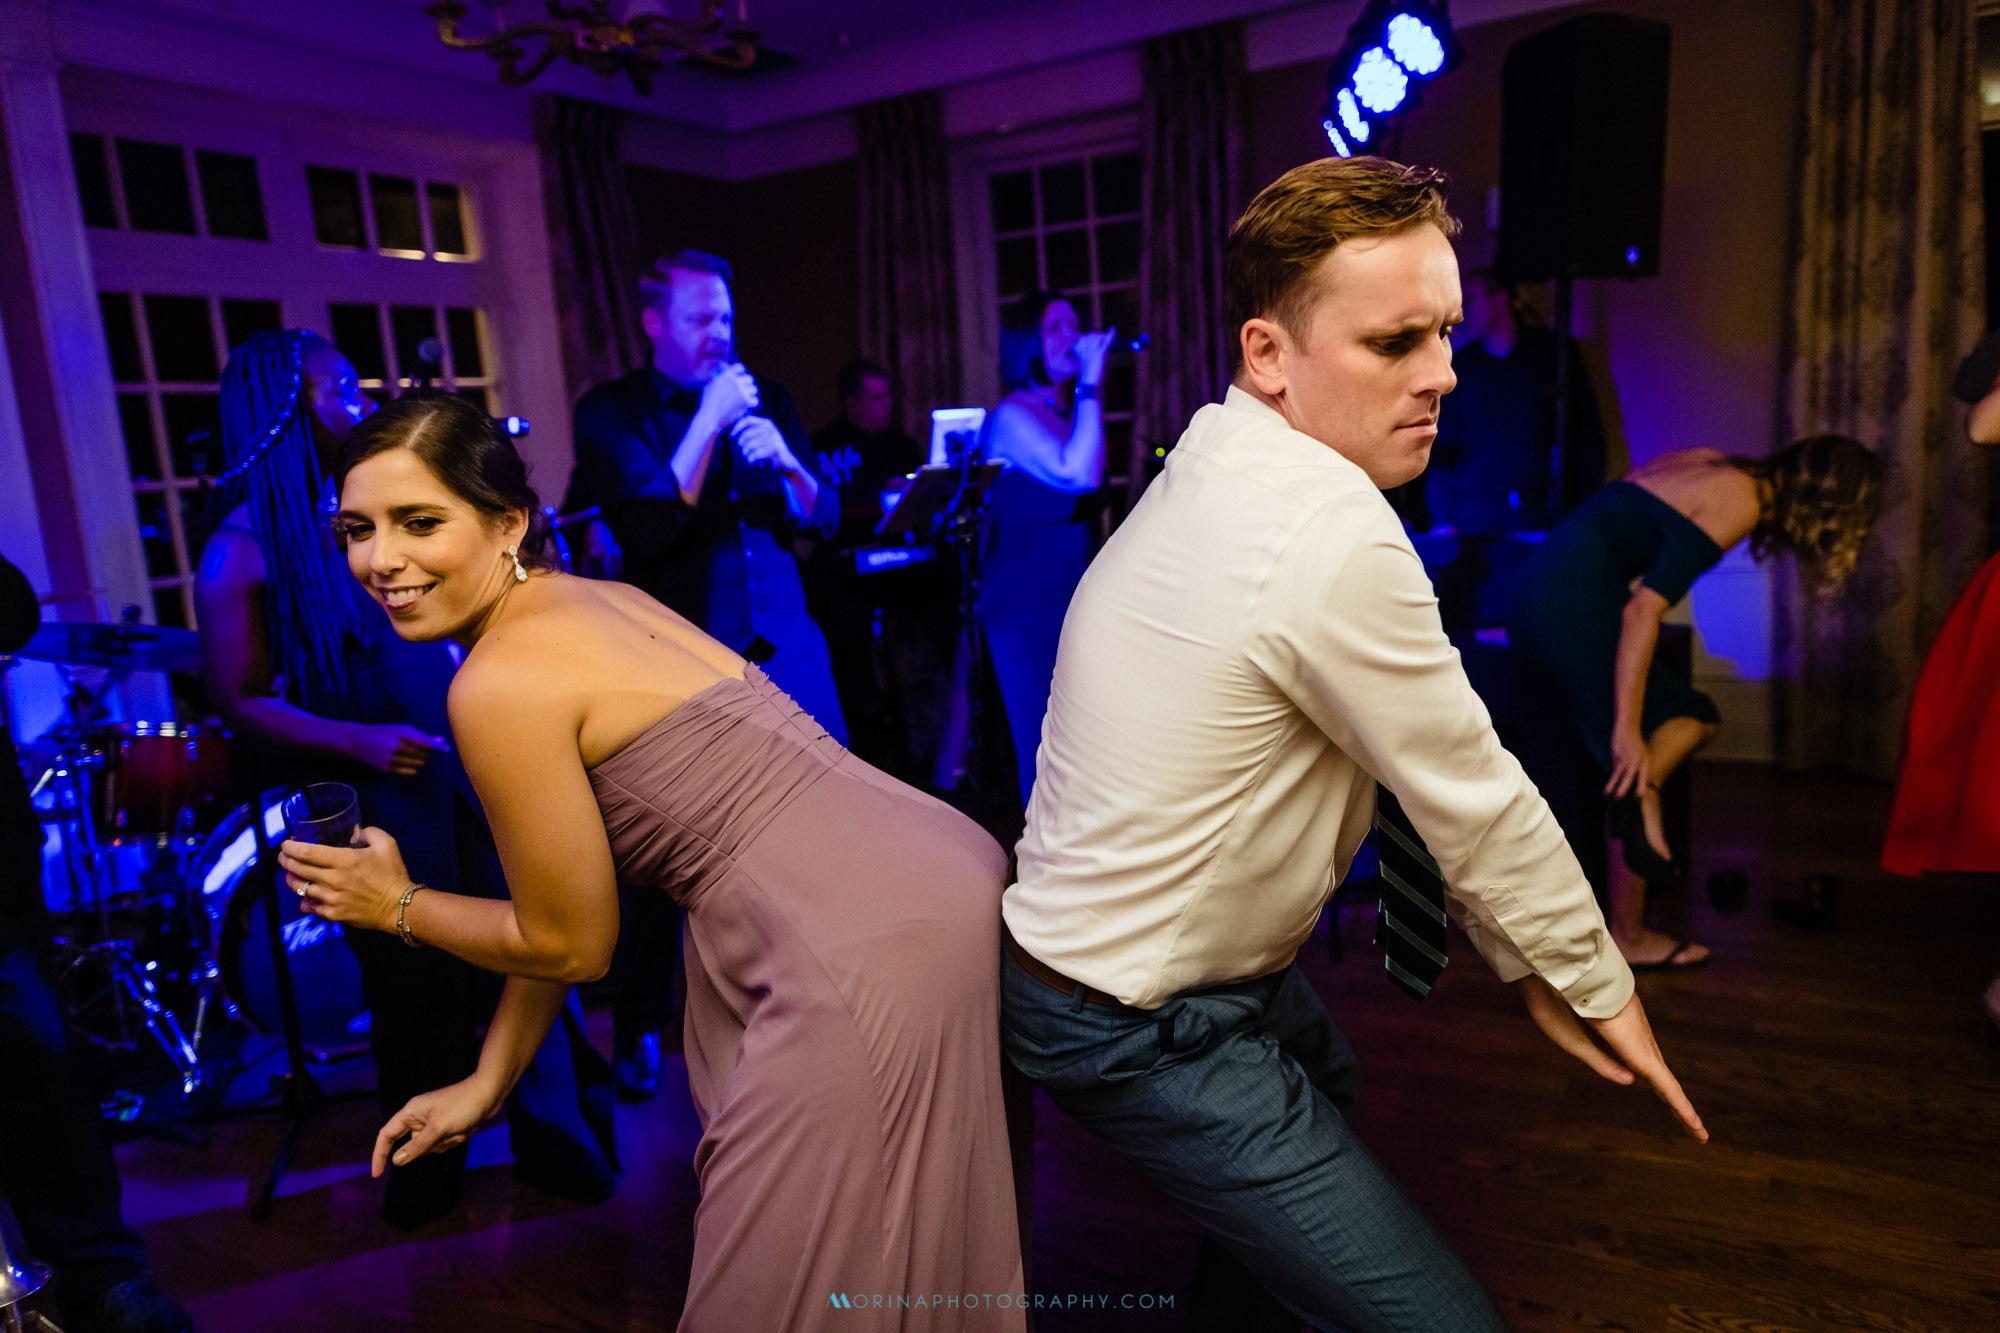 Colleen & Bill Wedding at Manufacturers' Golf & Country Club wedding 0085.jpg